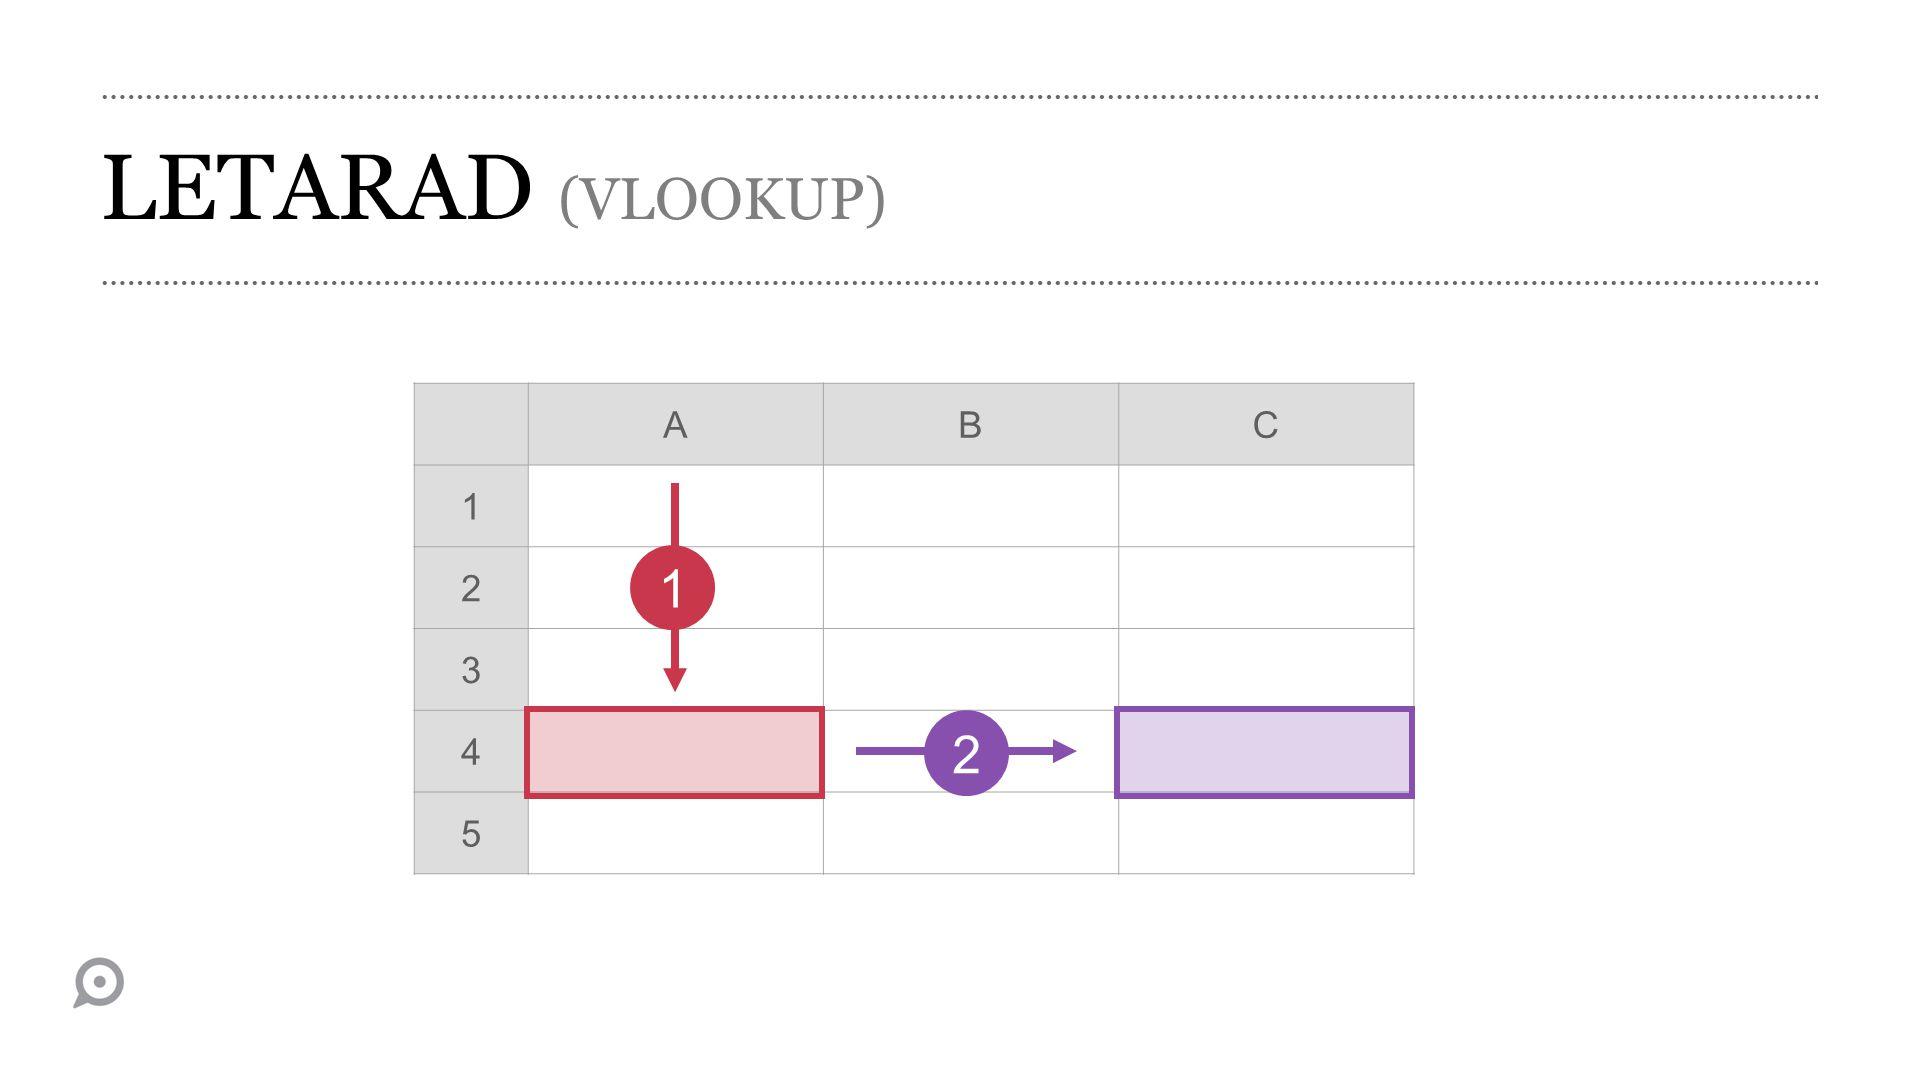 LETARAD (VLOOKUP) A B C 1 2 3 4 5 1 2